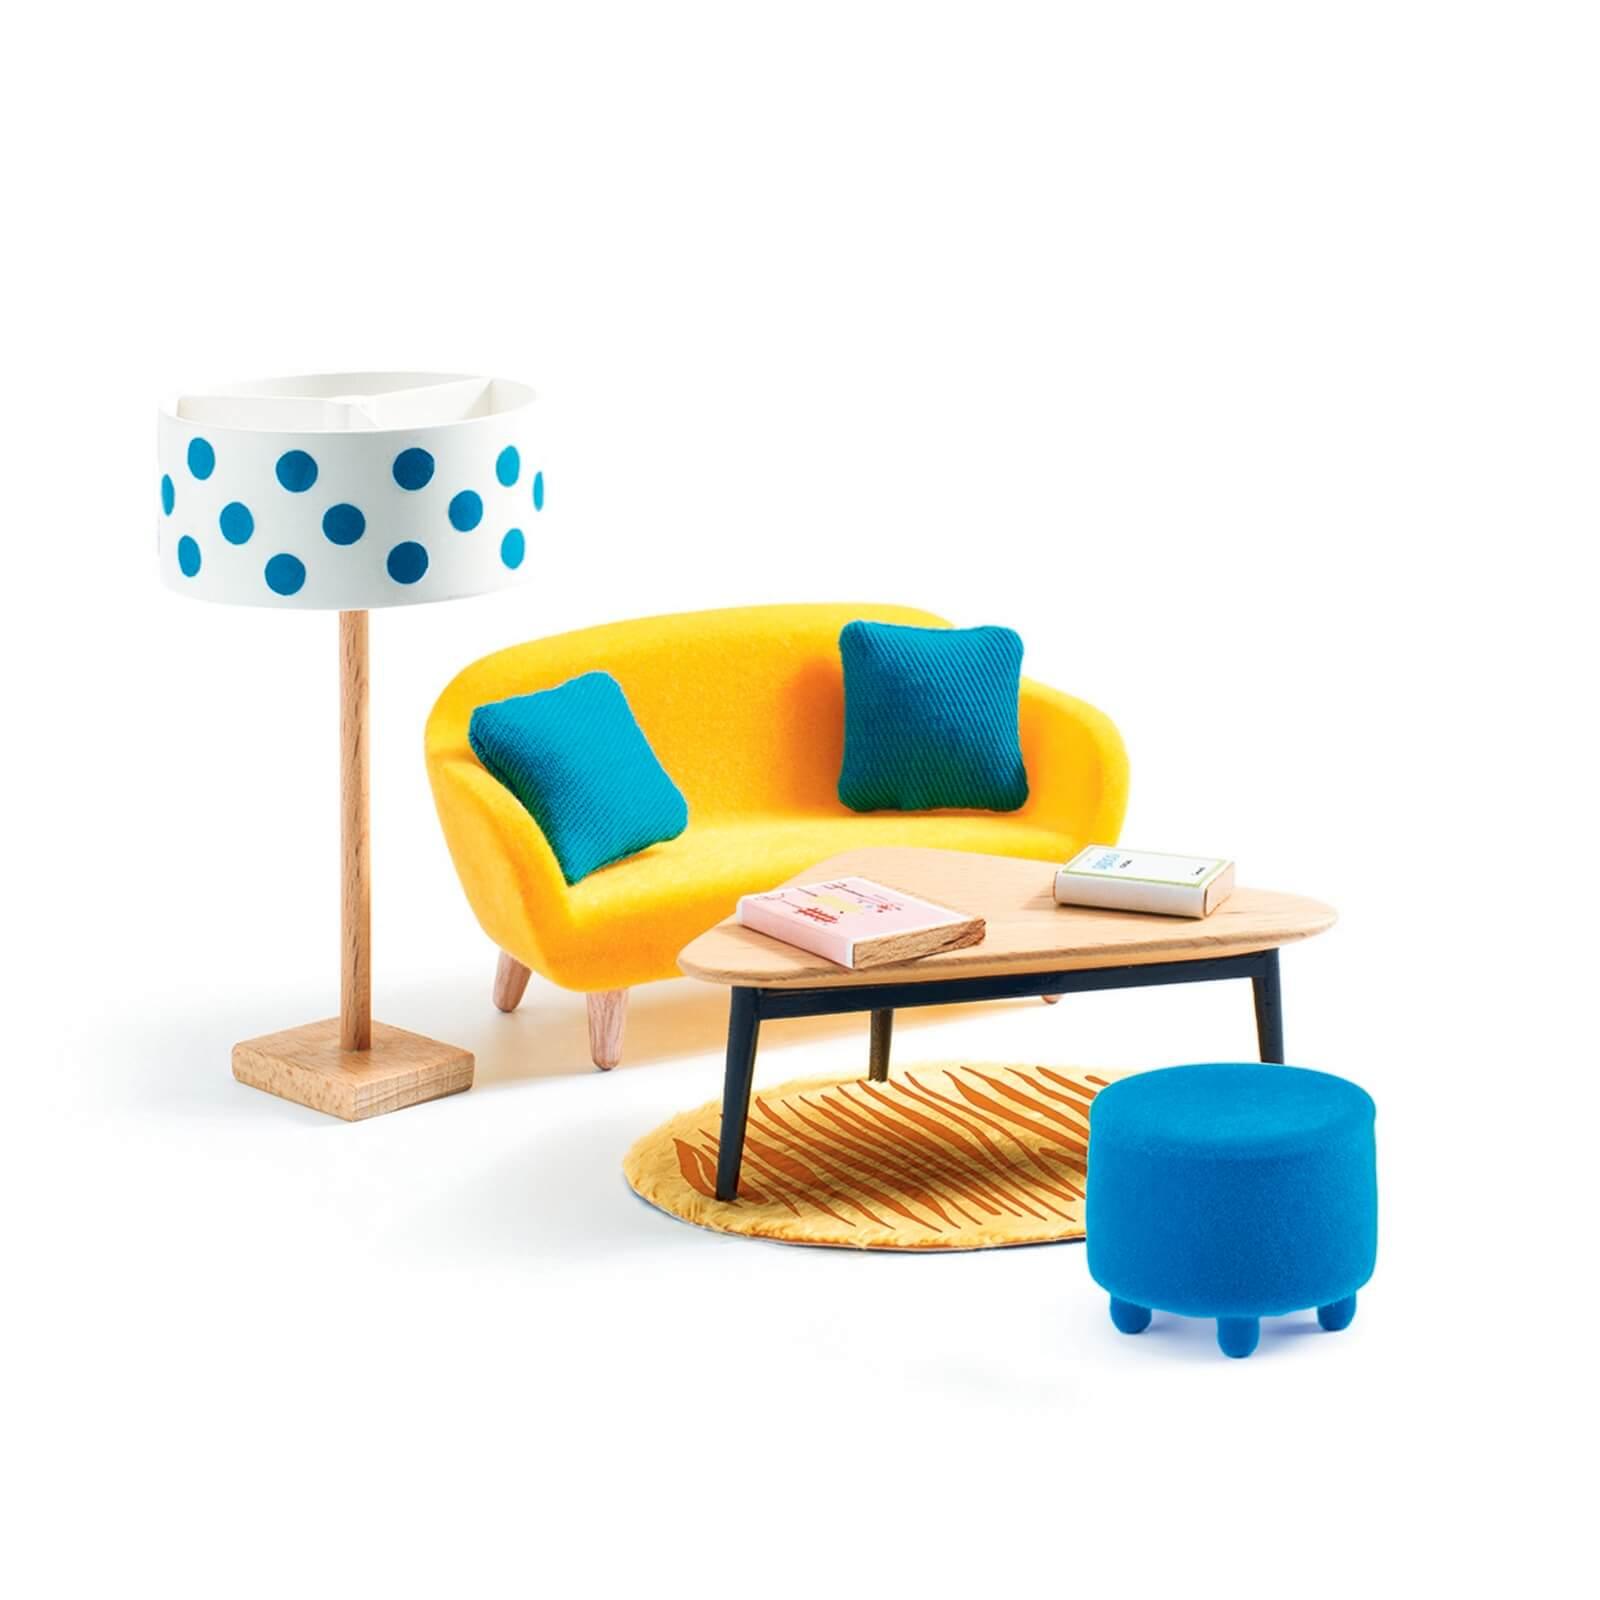 Djeco The Orange Living Room Dolls House Furniture 1:16